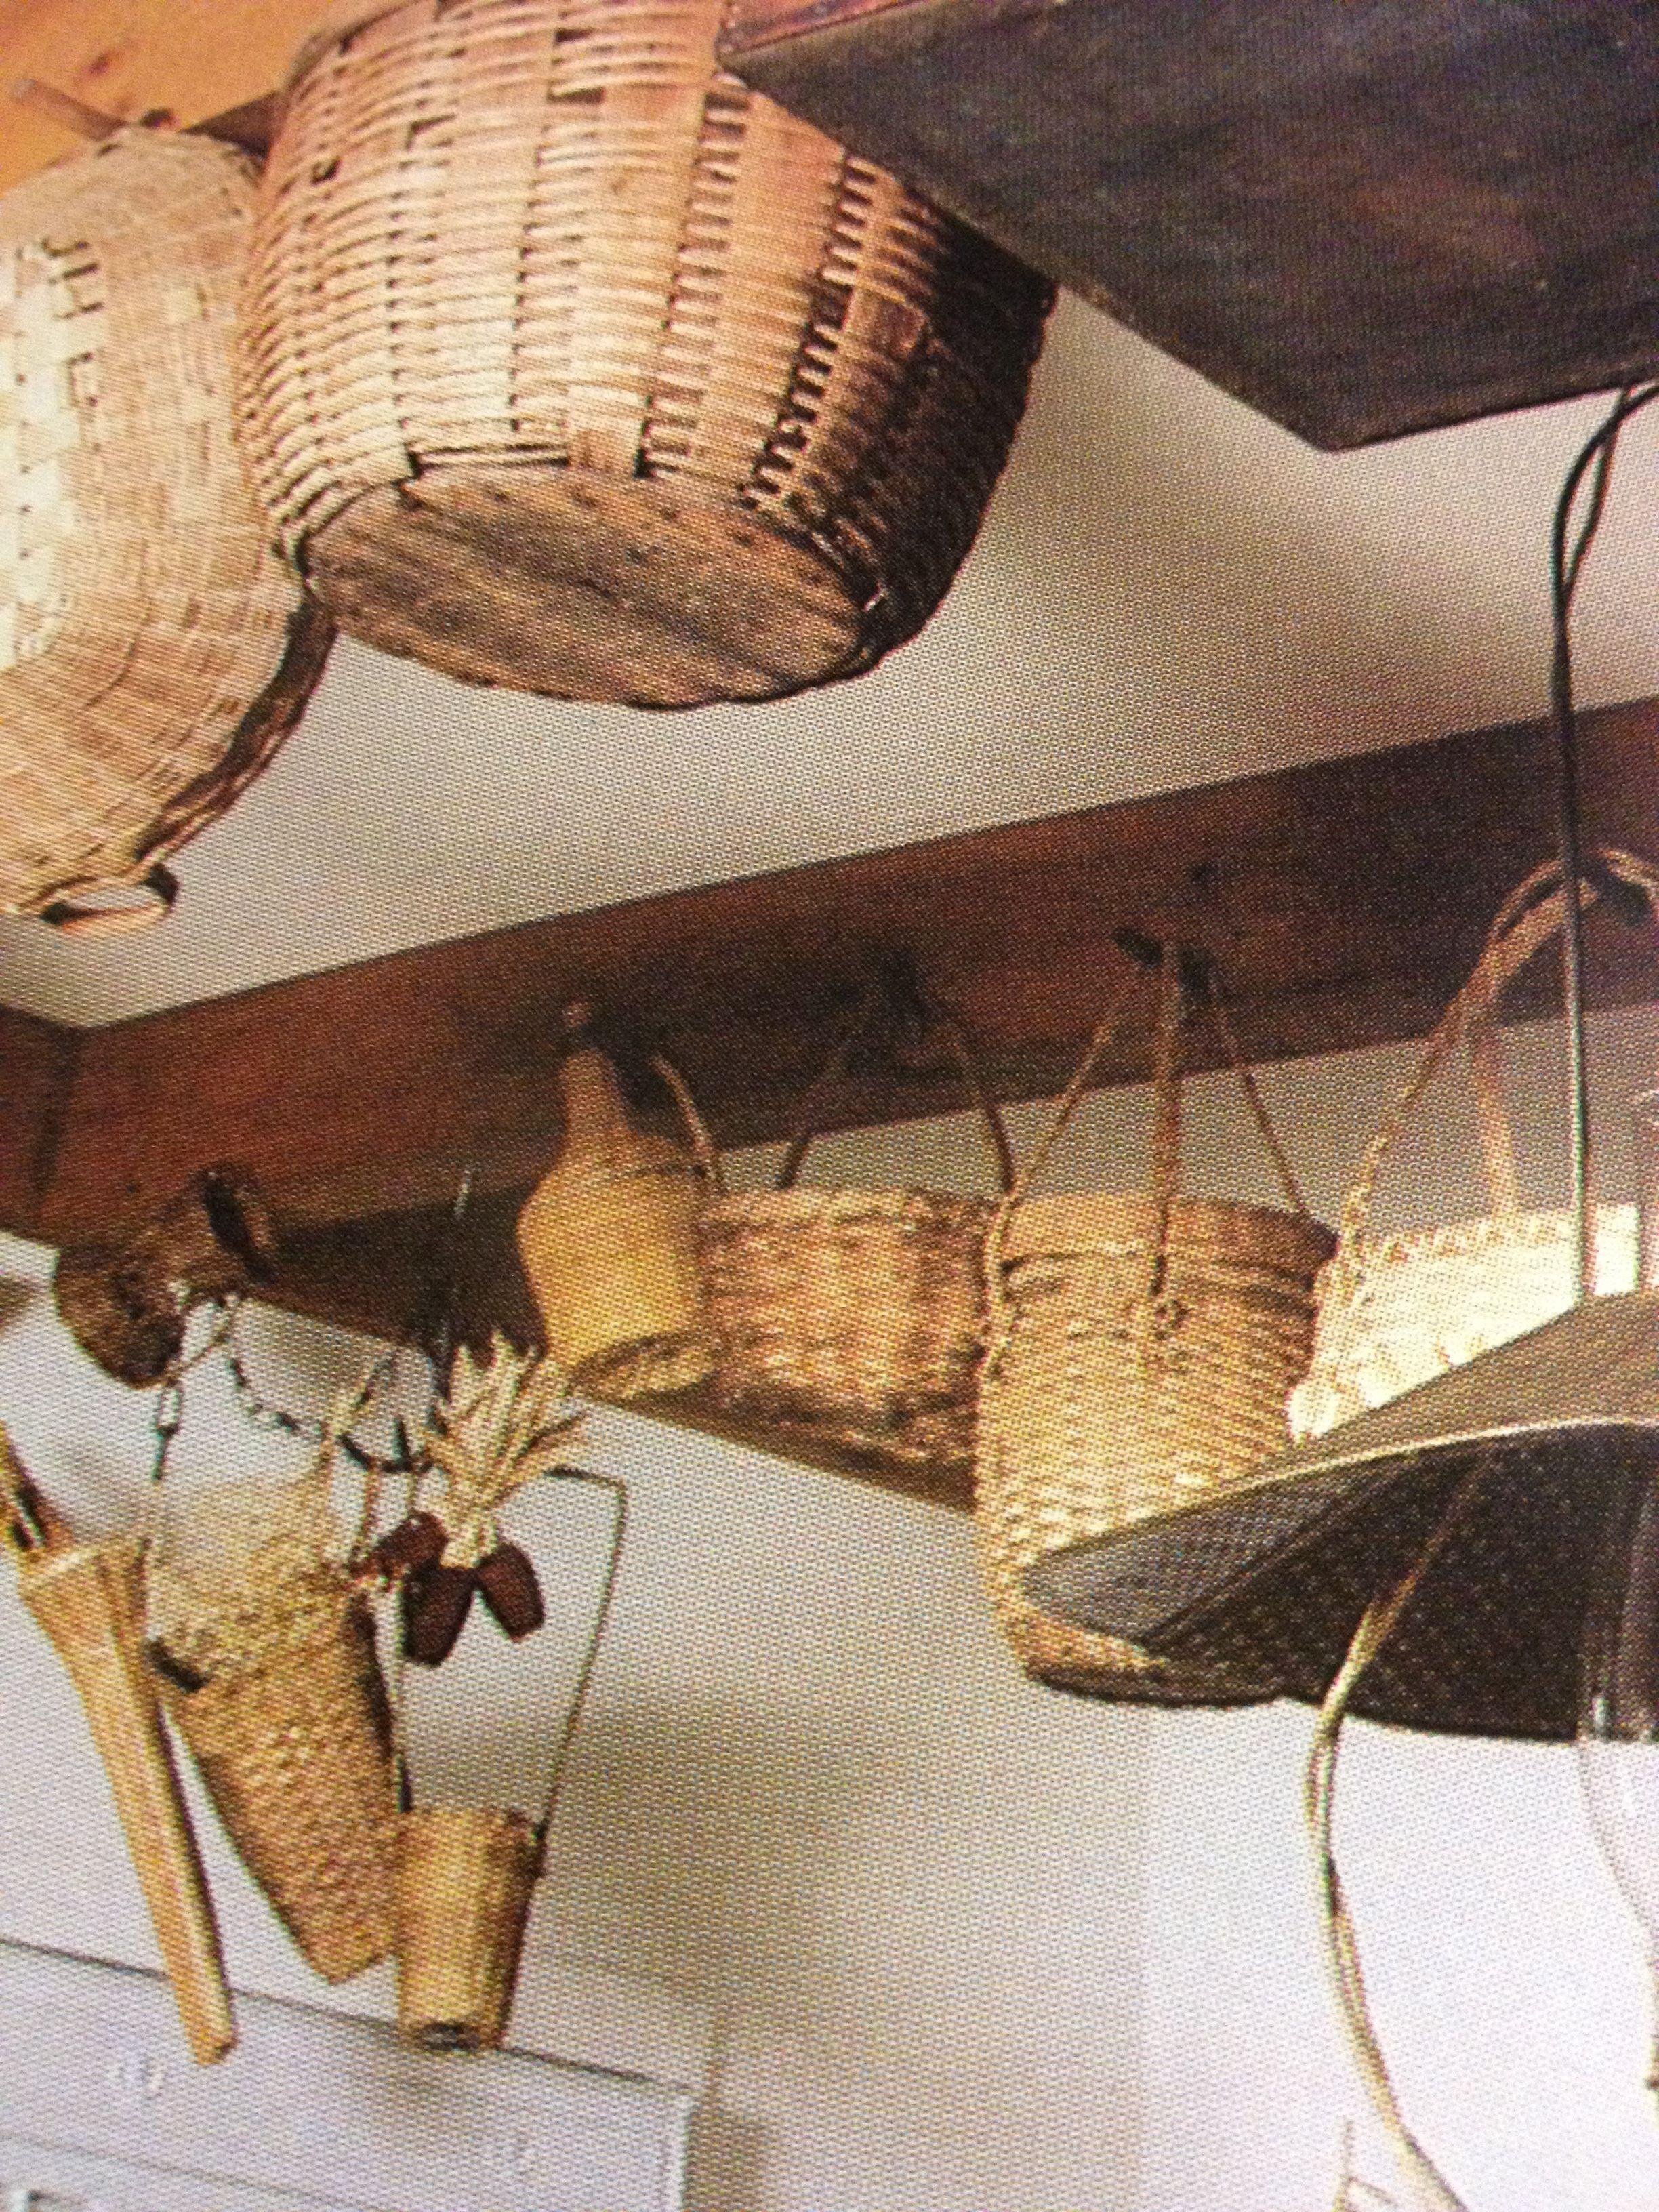 New Small Wicker Basket Pics Of Basket Idea